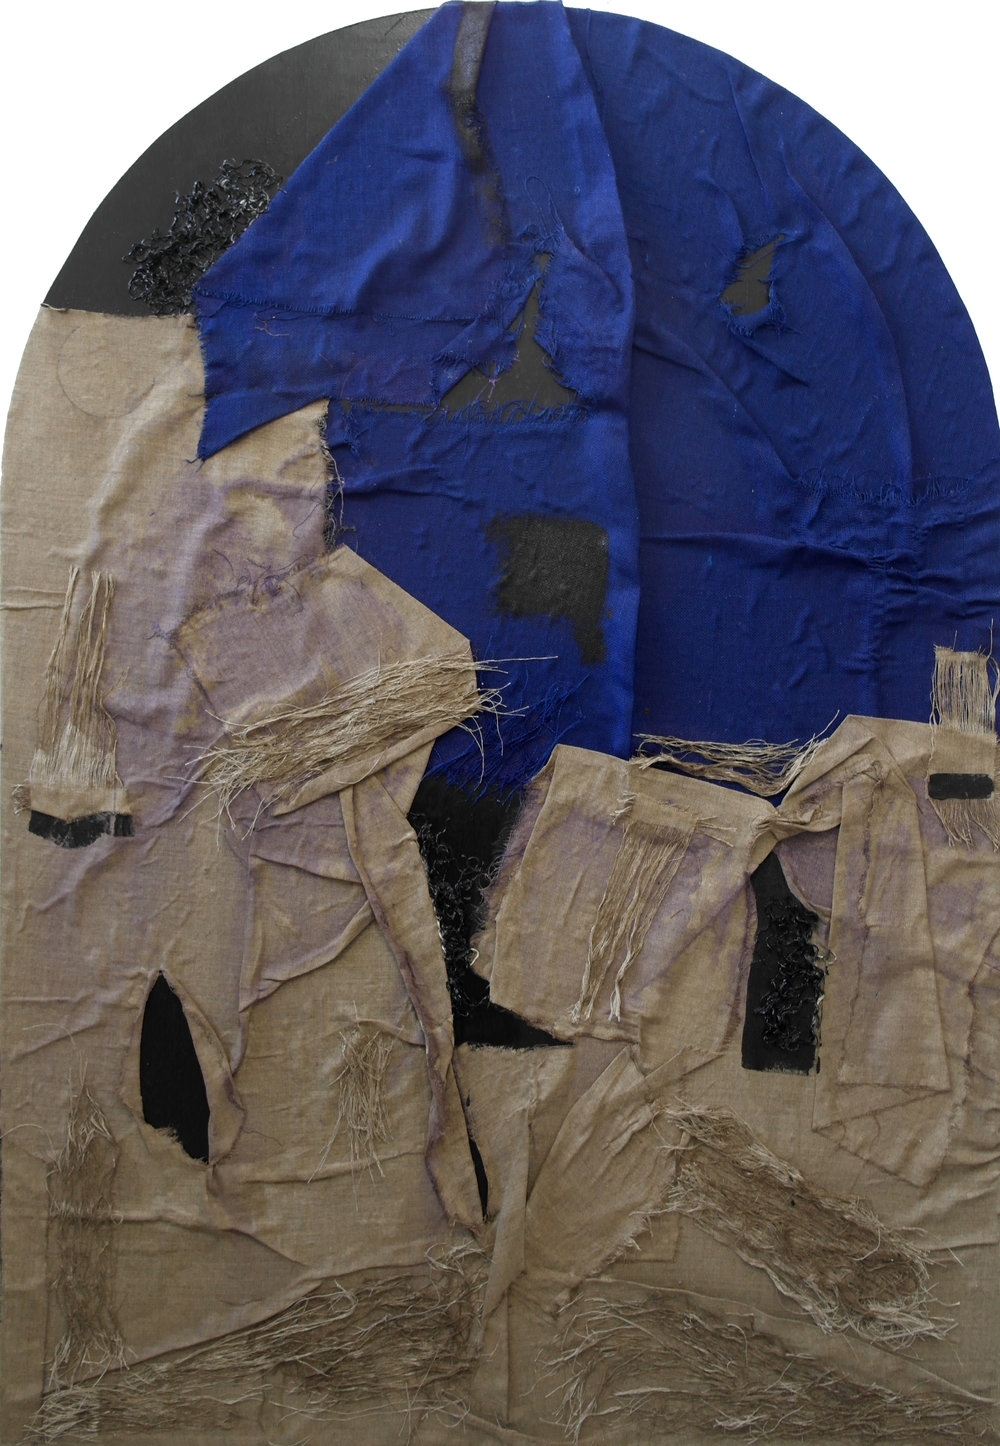 Untitled After Piero della Francesca  - 2016  Oil paint, burlap, rope, PVA, threads, linen canvas applied on board  167 x 116 cm